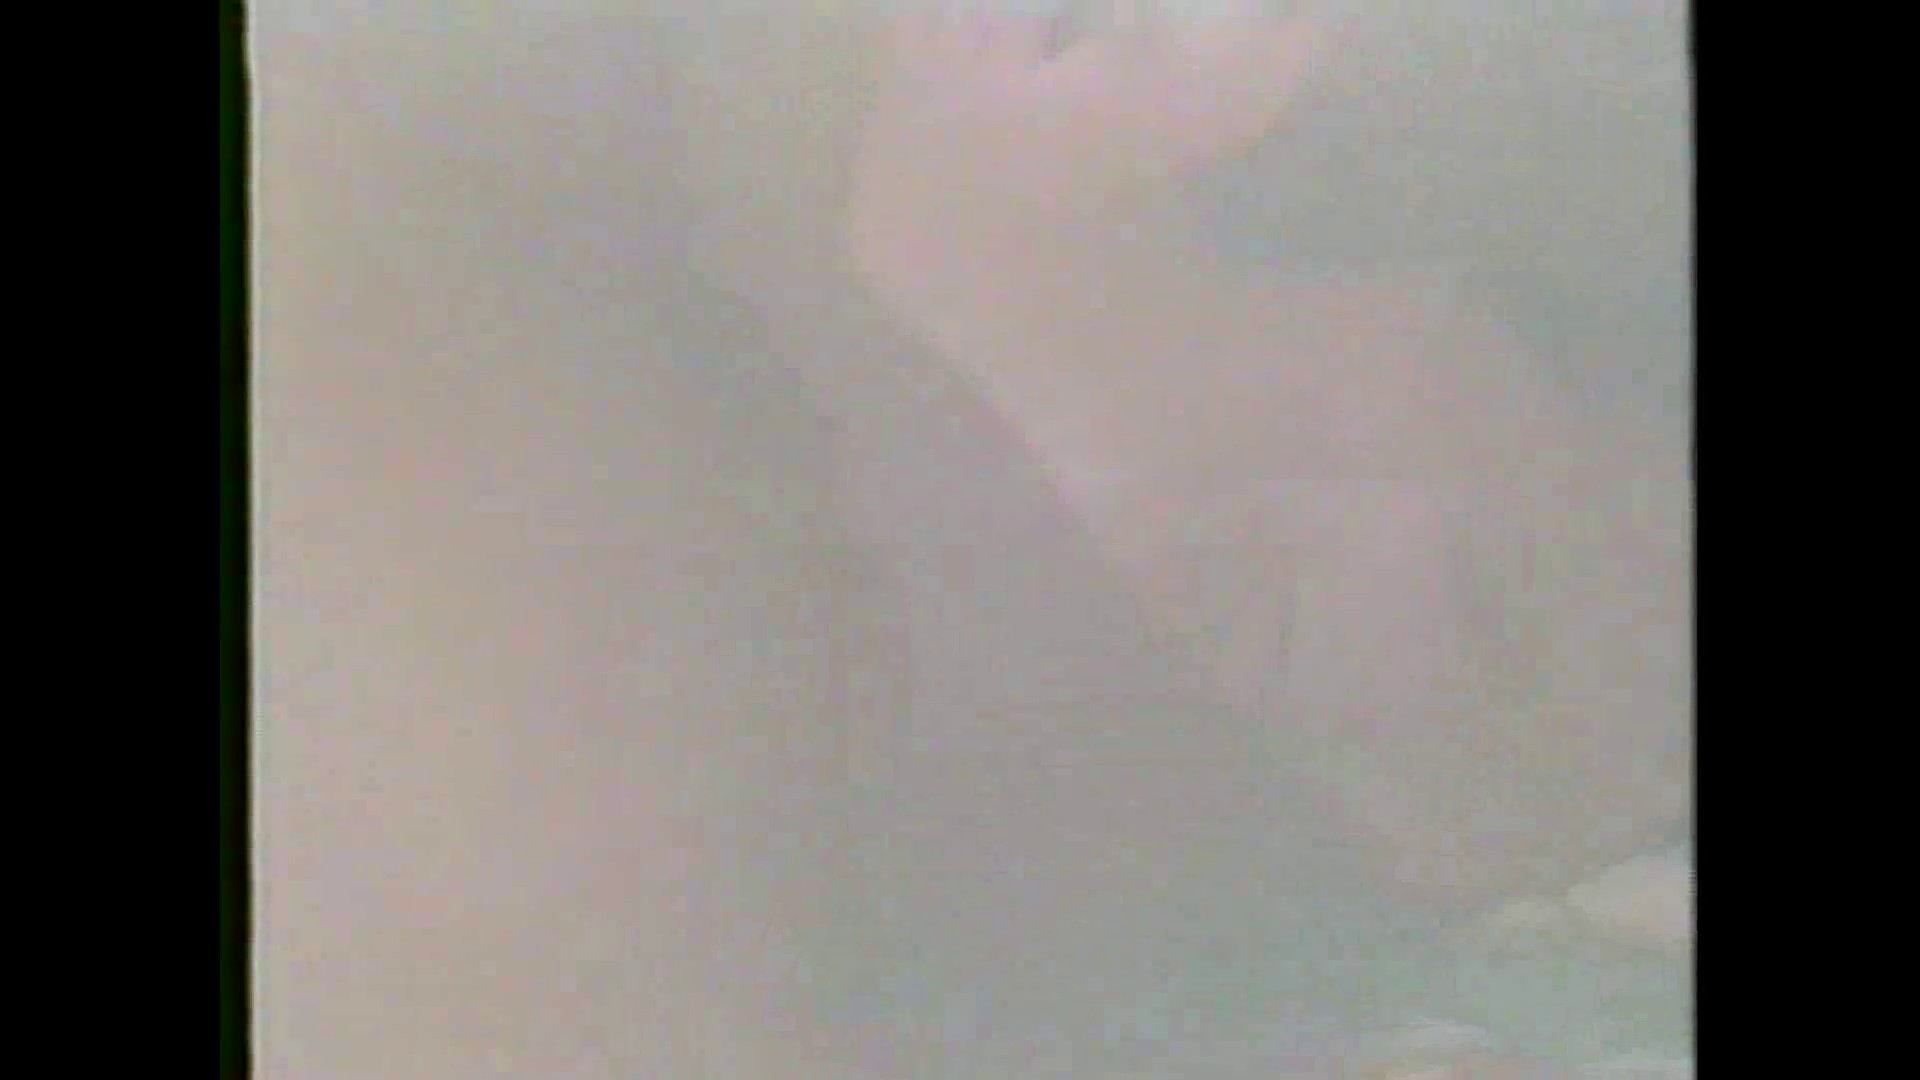 GAYBOY宏のオカズ倉庫Vol.12-1 ディープキス | オナニー チンコ画像 10連発 8